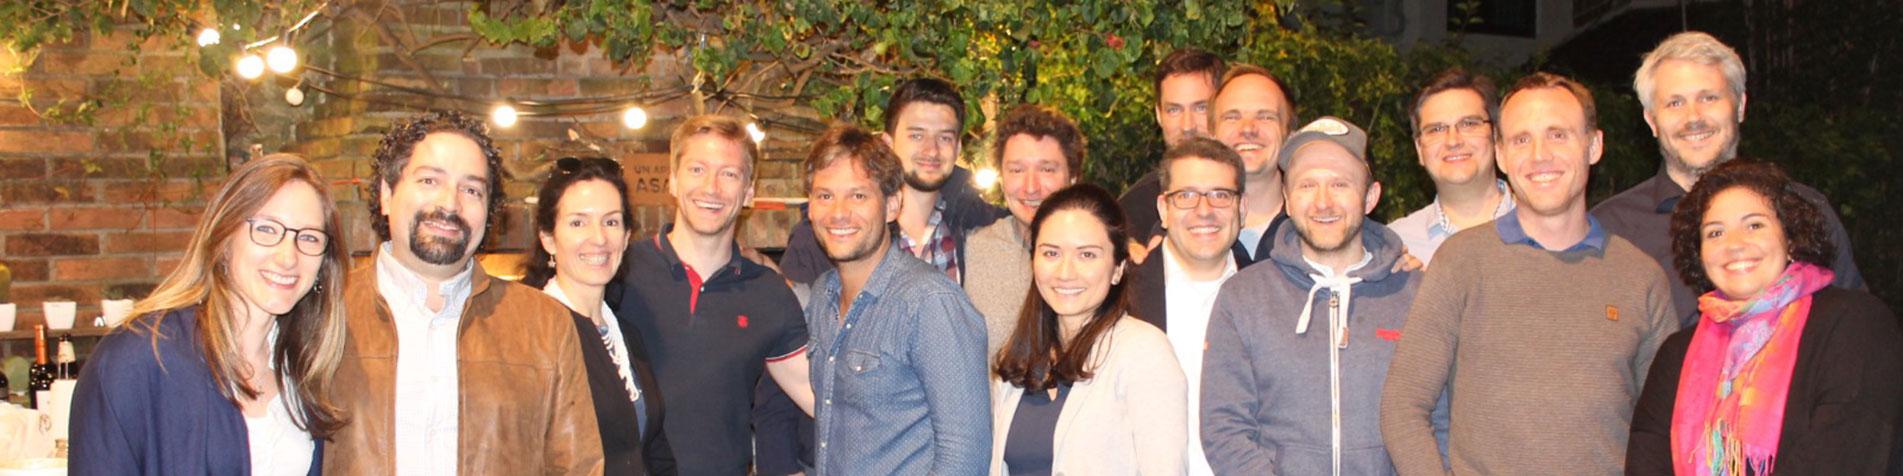 Studienreise: Der Executive MBA in Buenos Aires